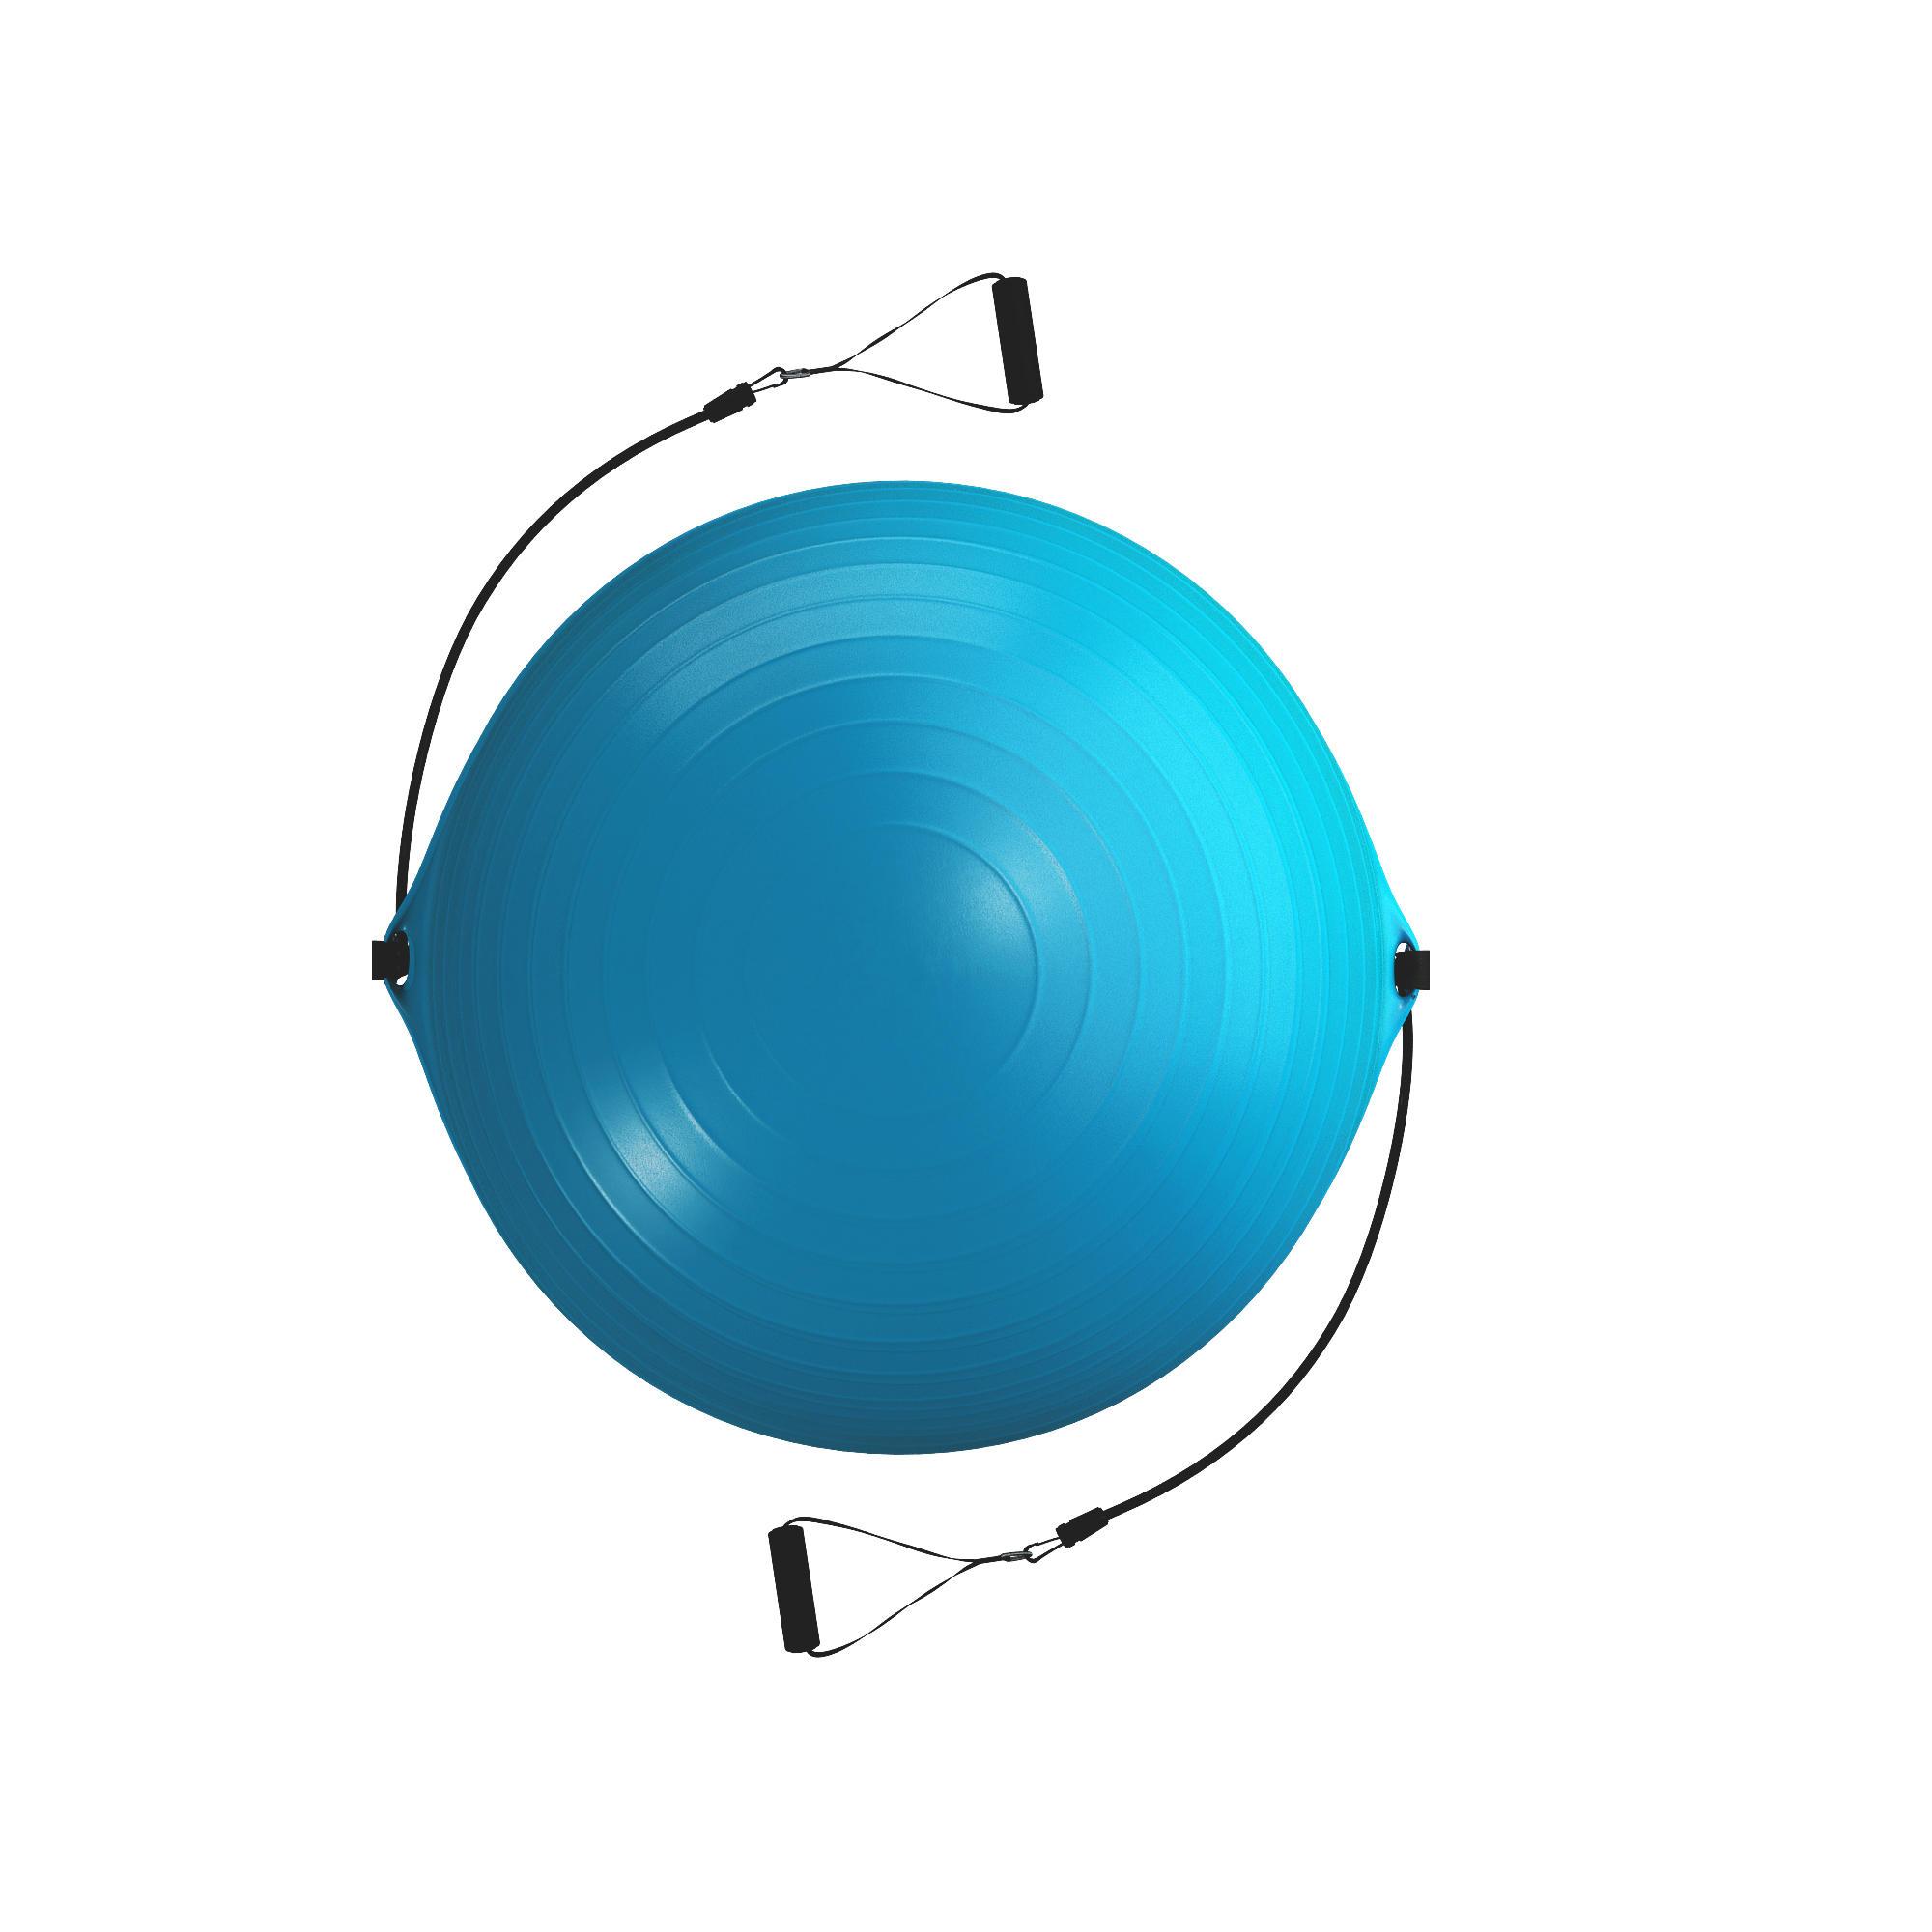 120 Medium Pilates Ball + Elastics